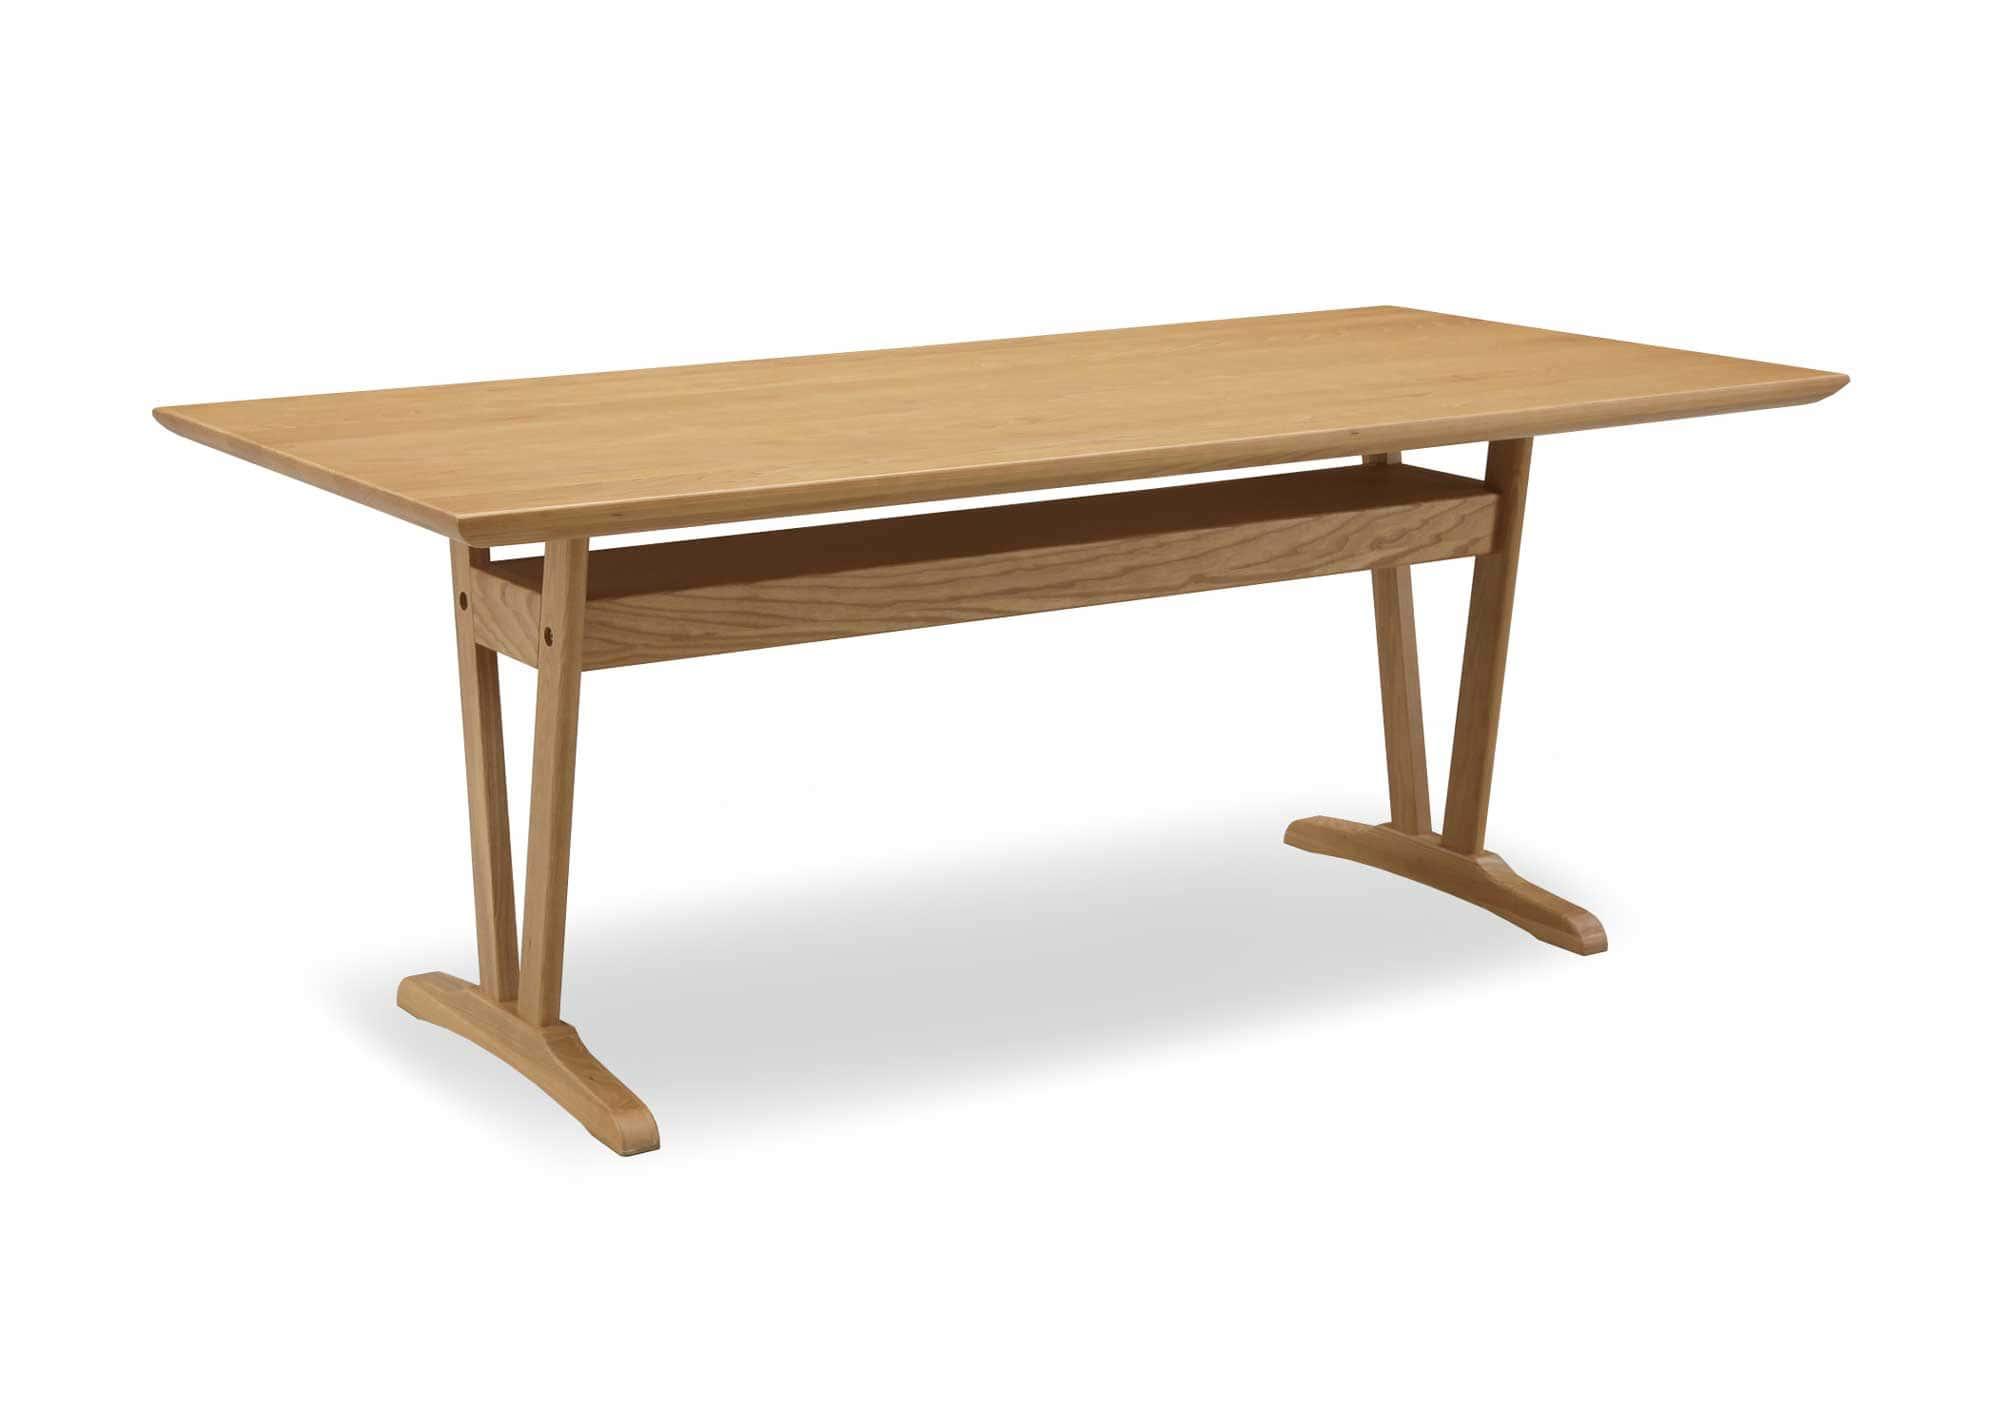 LDテーブル モモ165:LDテーブル モモ165